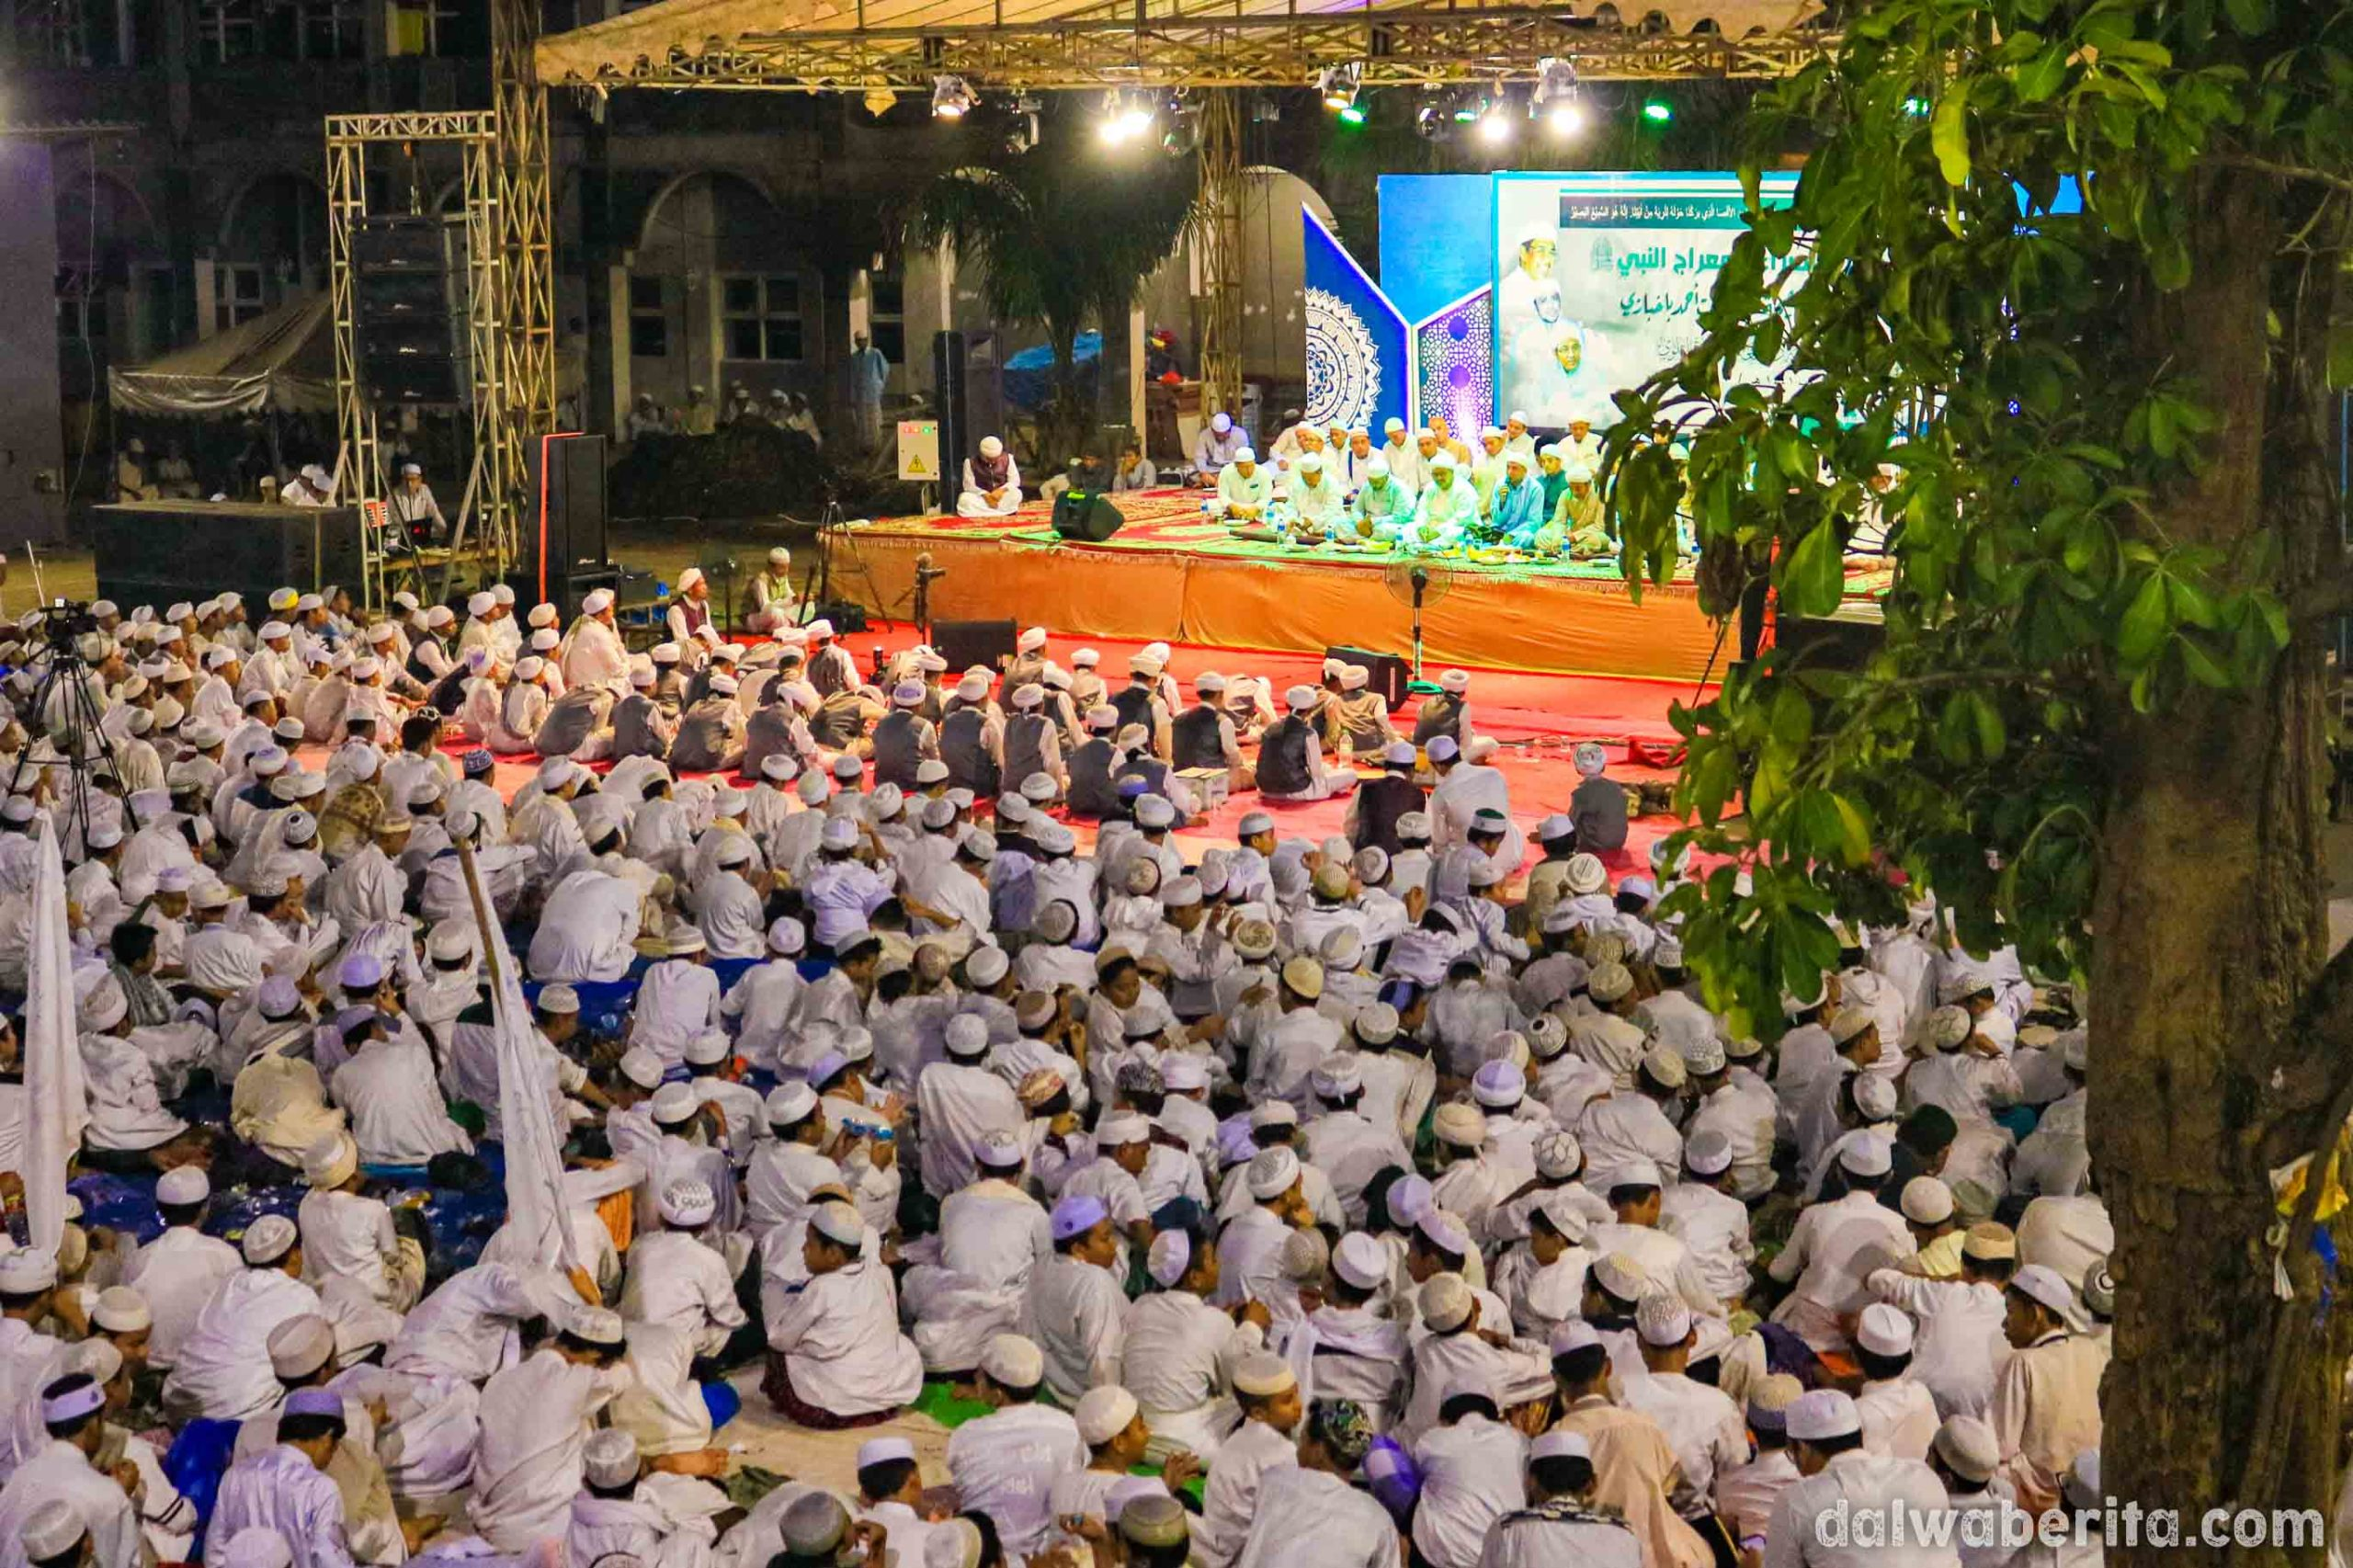 Antusias Dalwa Ba'alawi Saat Rayakan Isra Mi'raj Nabi Muhammad